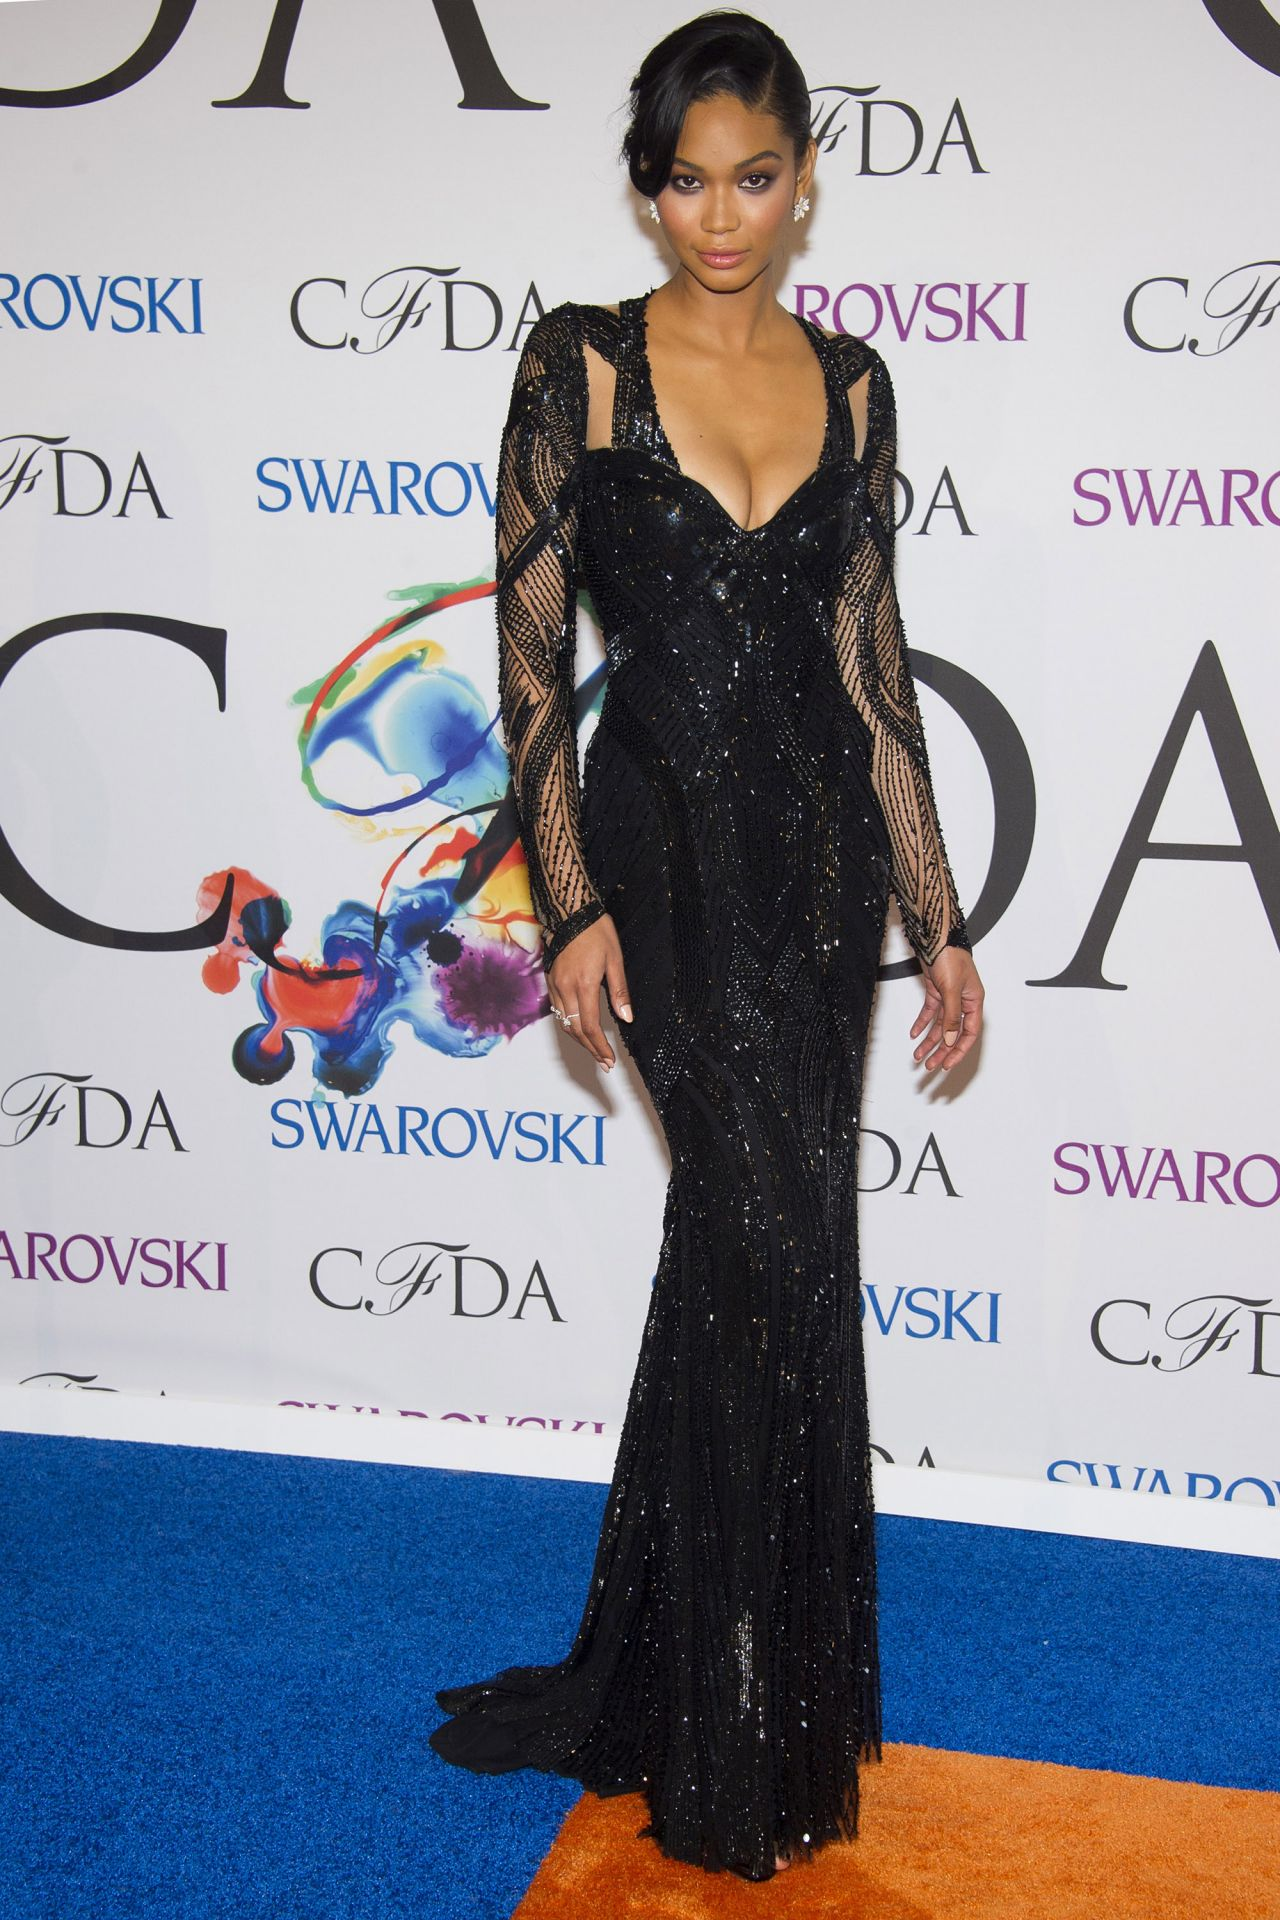 Chanel Iman - 2014 CFDA Fashion Awards